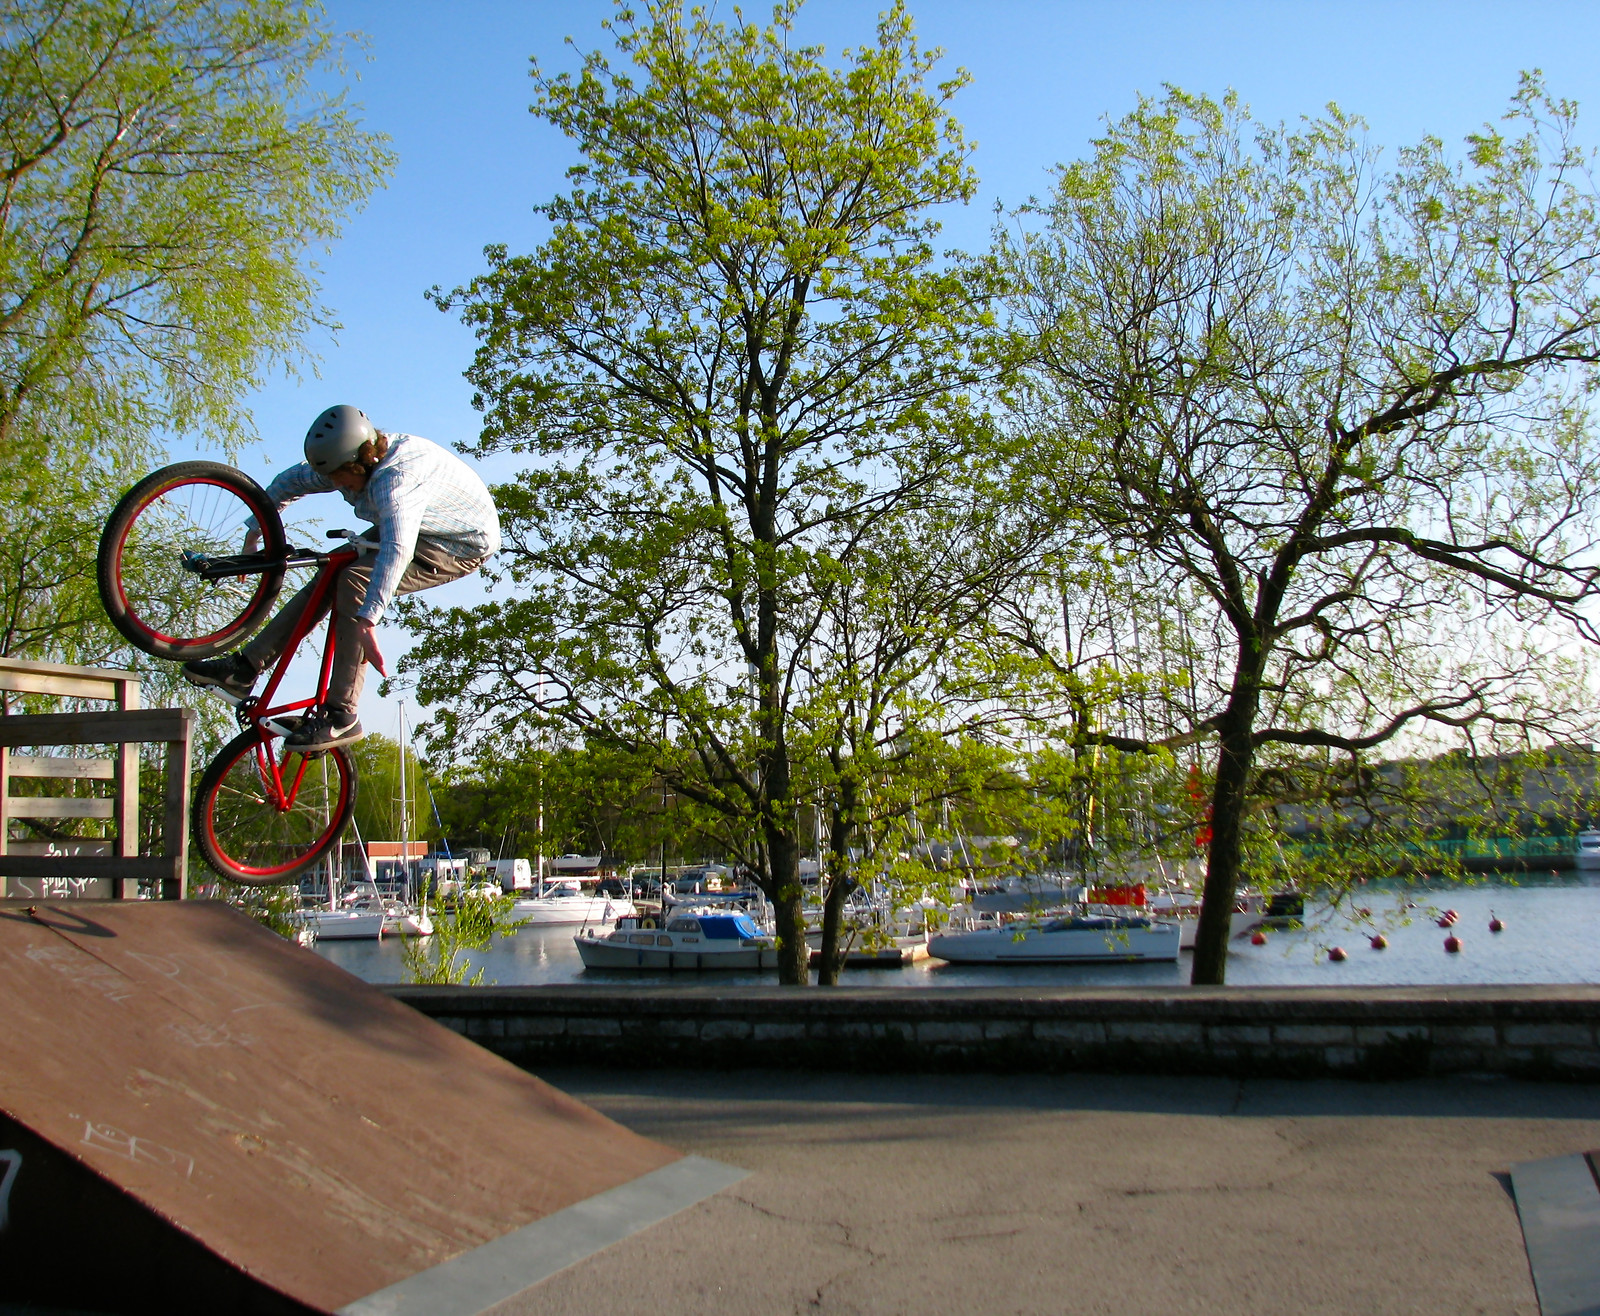 No hander on a bank - KasparKalmer - Mountain Biking Pictures - Vital MTB